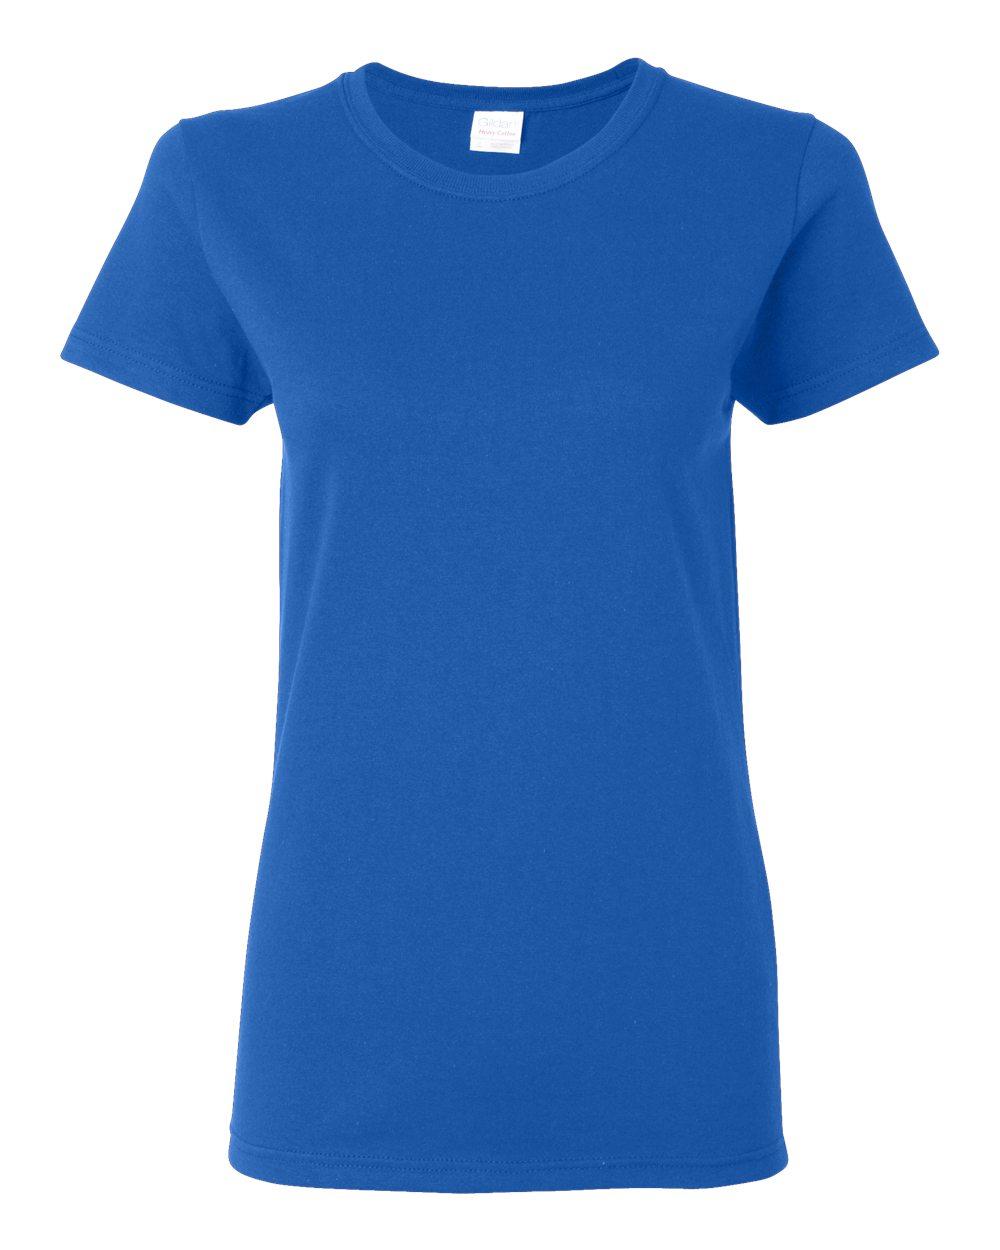 Gildan_5000L_Royal Blue Custom T Shirts